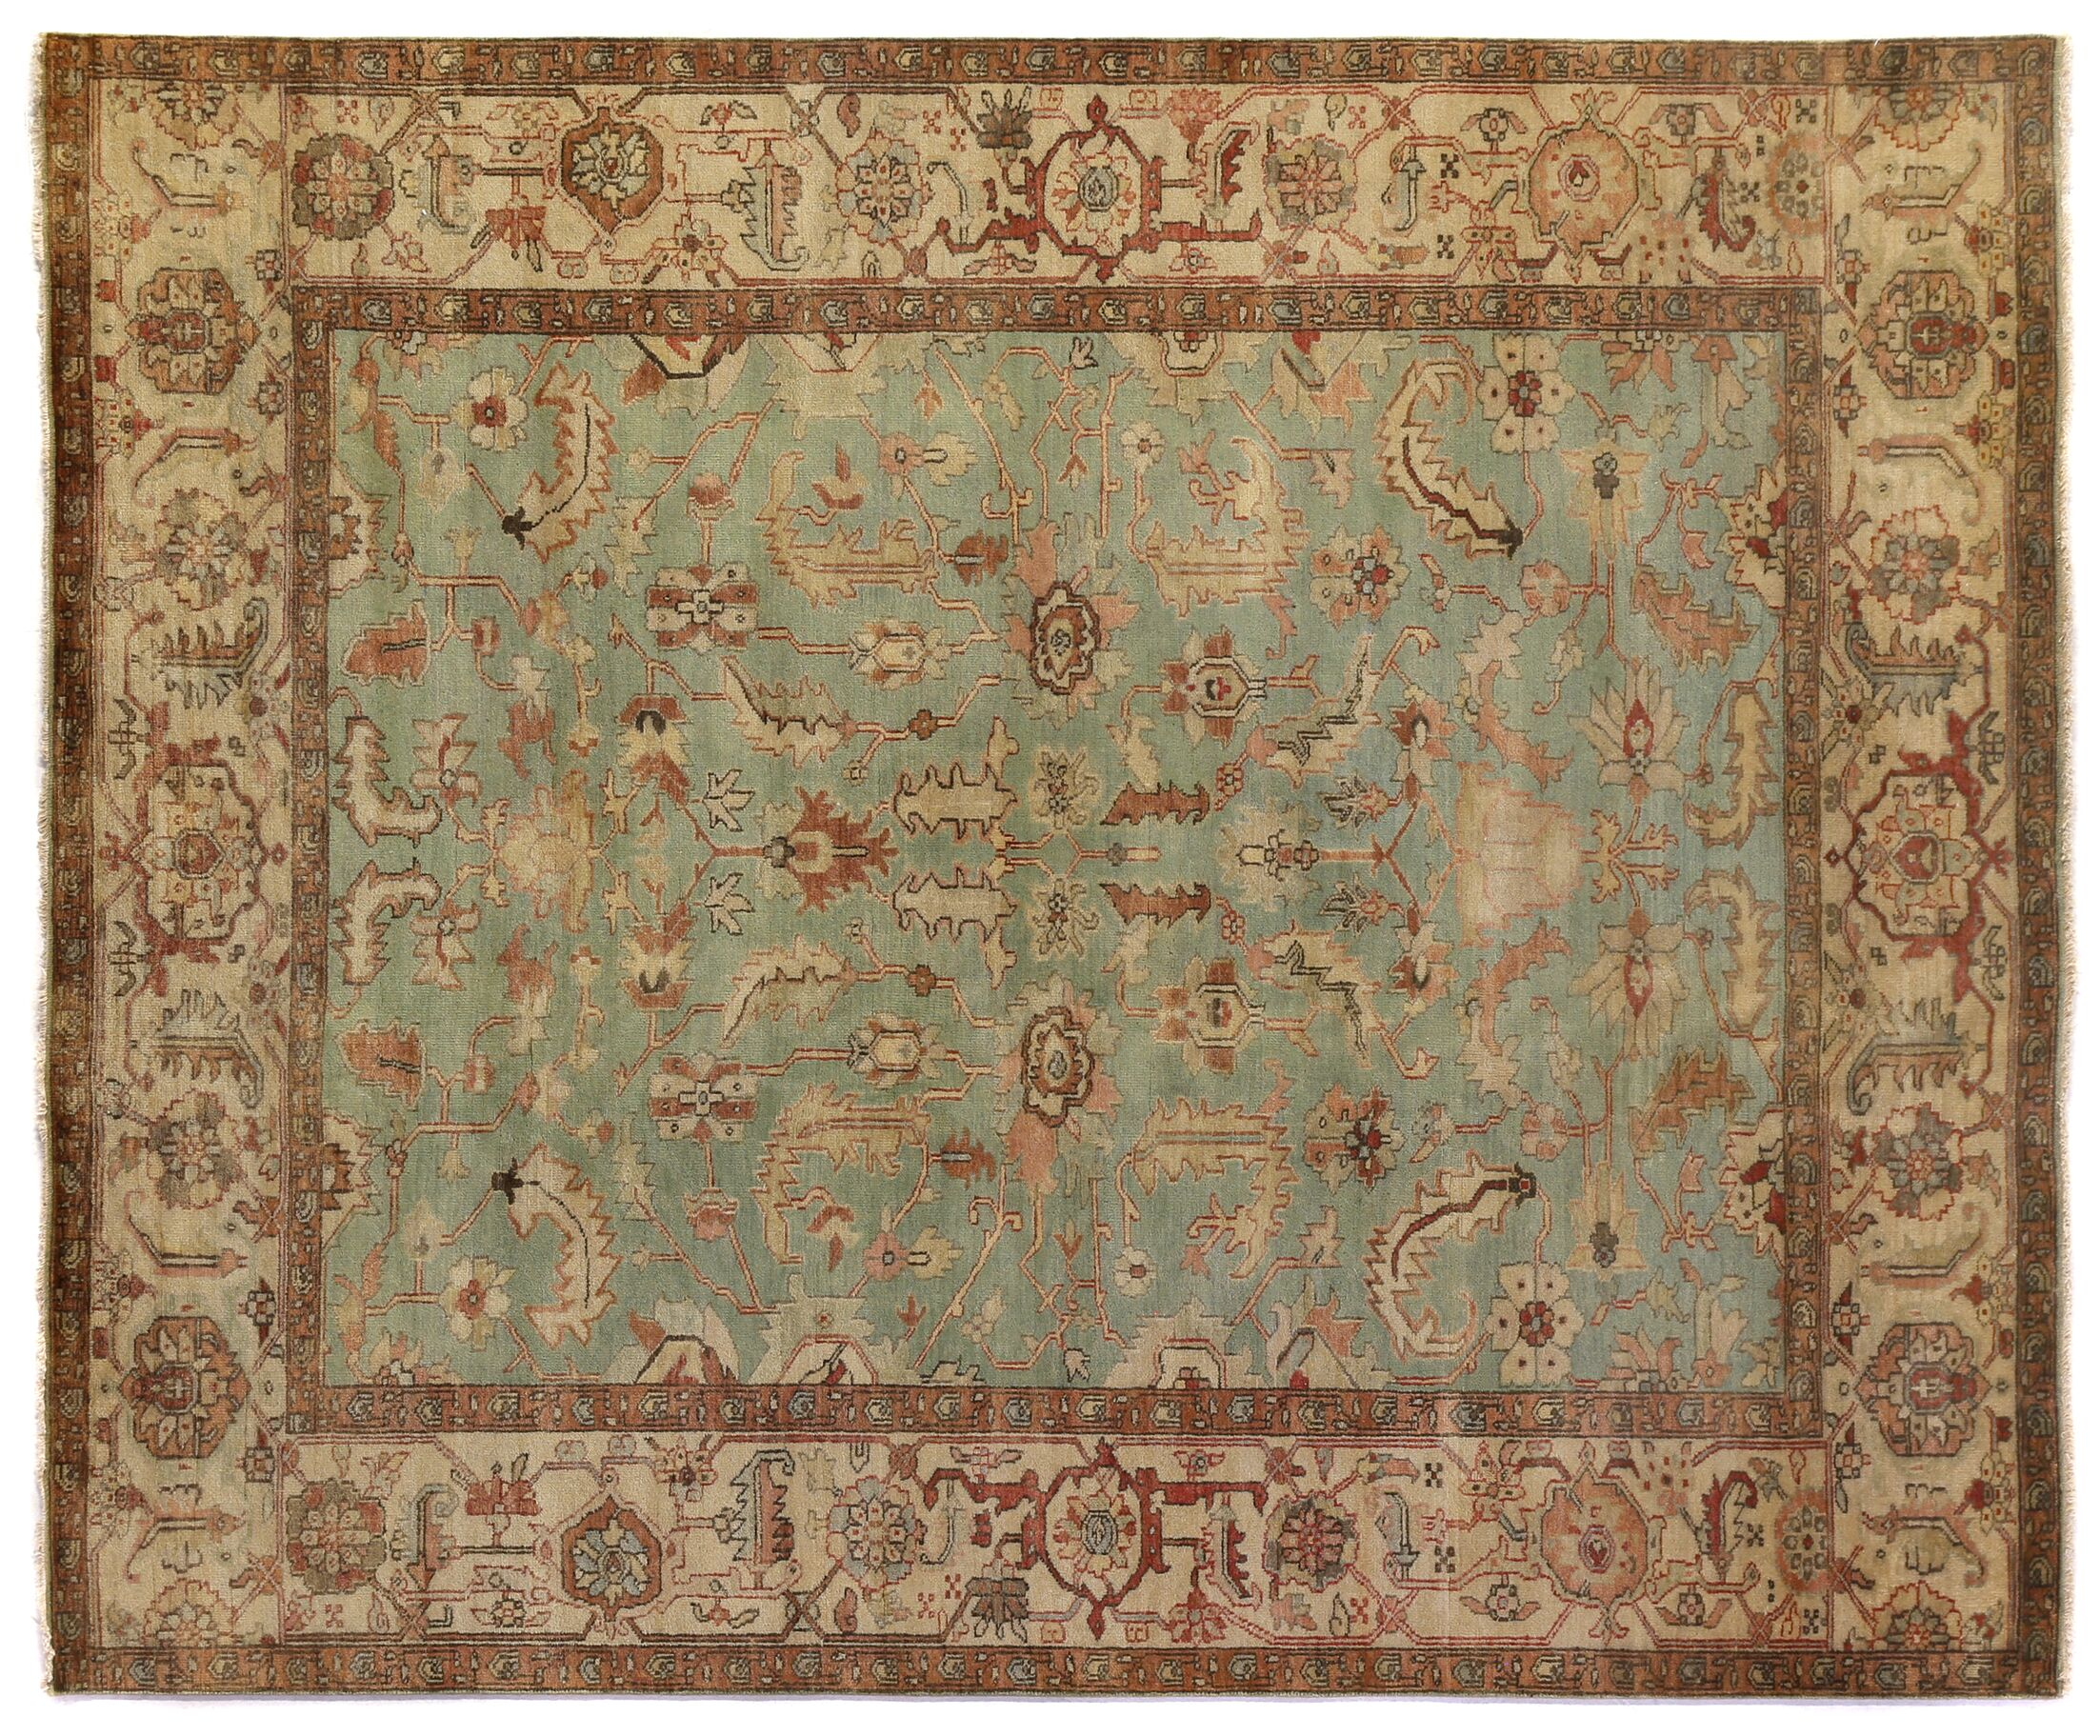 Serapi Hand-Knotted Wool Light Blue/Ivory Area Rug Rug Size: Rectangle 4' x 6'